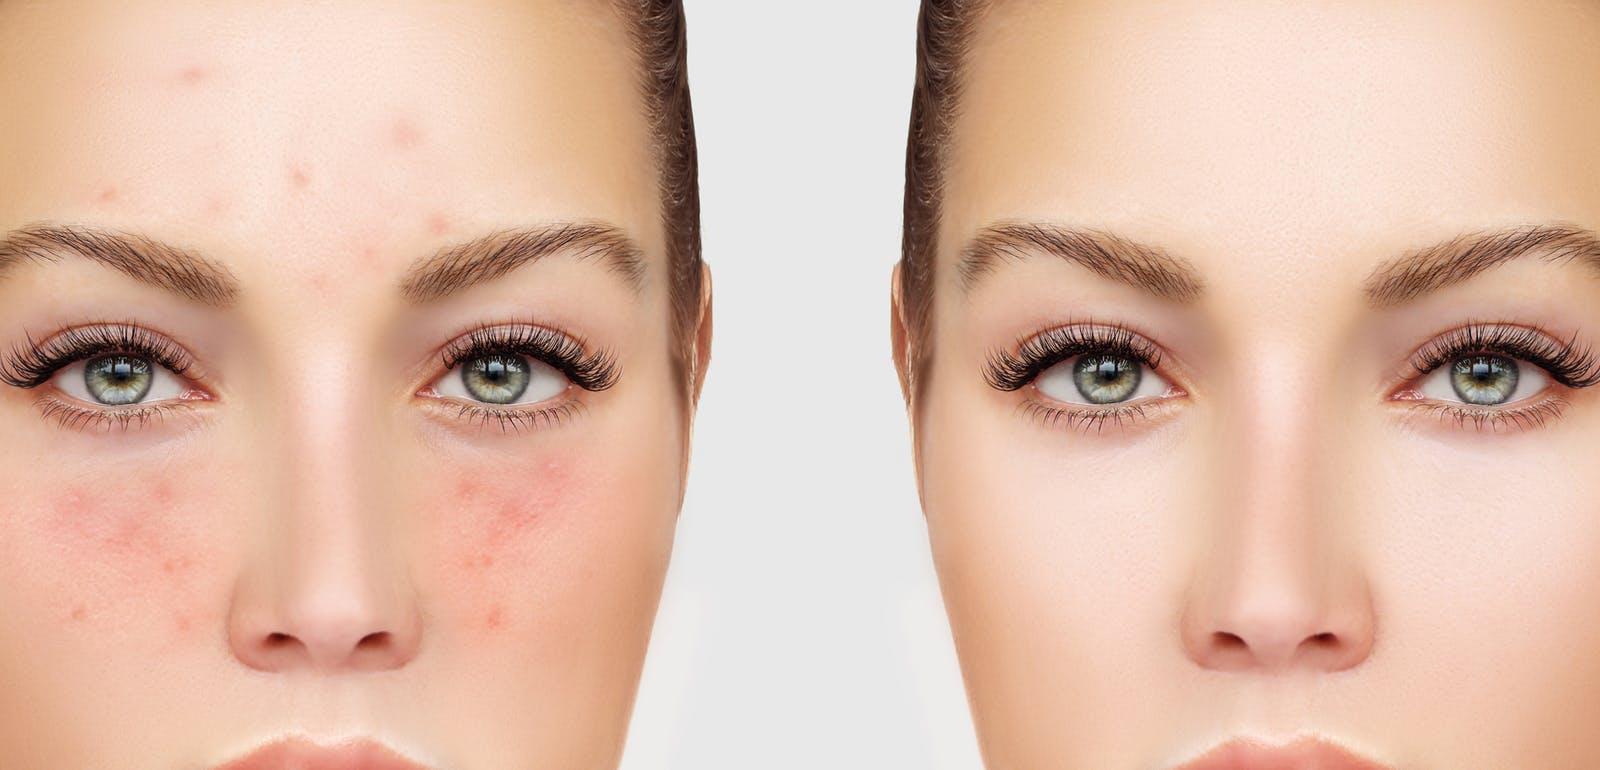 The acne positivity movement